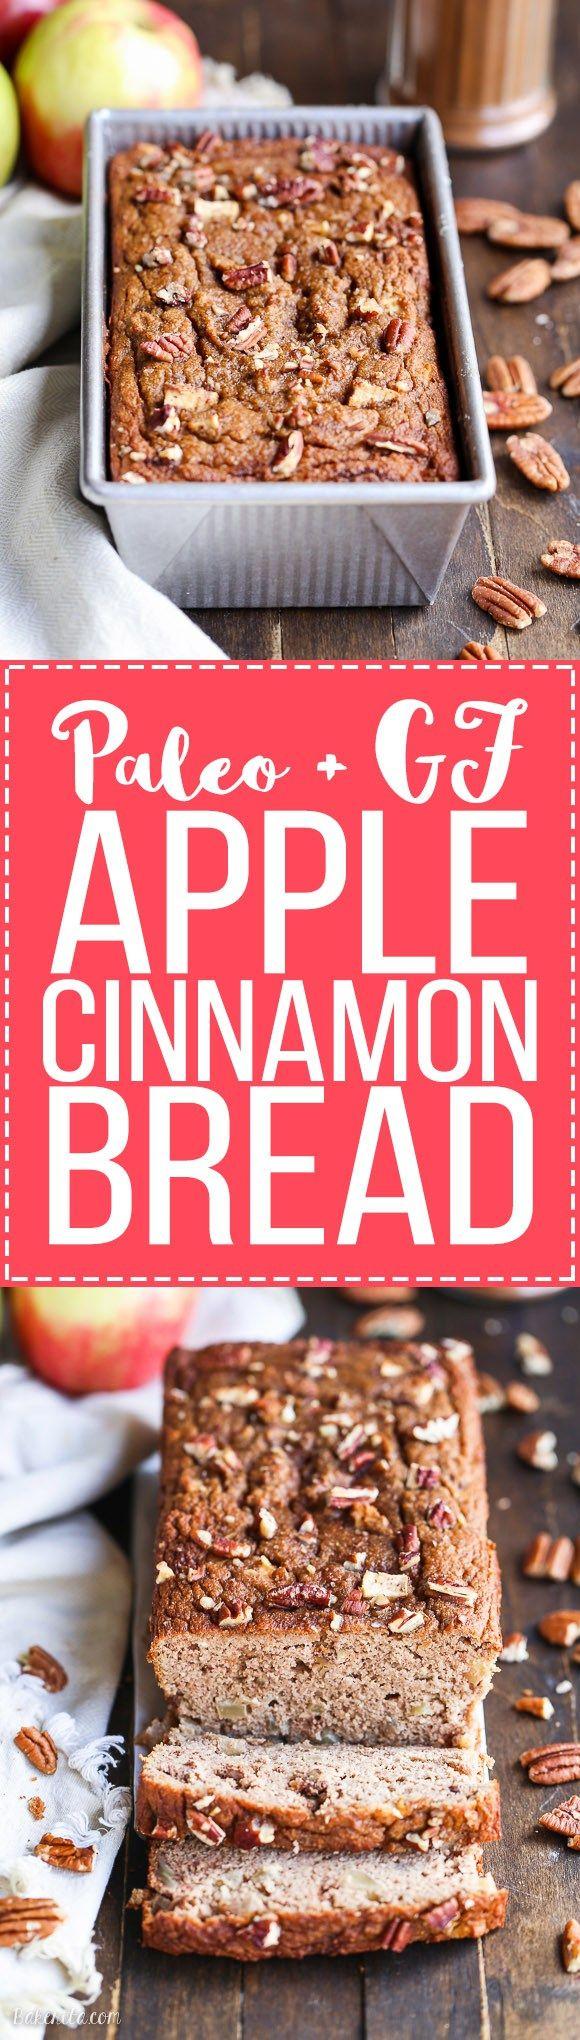 Paleo Apple Cinnamon Bread Recipe {gluten-free, dairy-free}